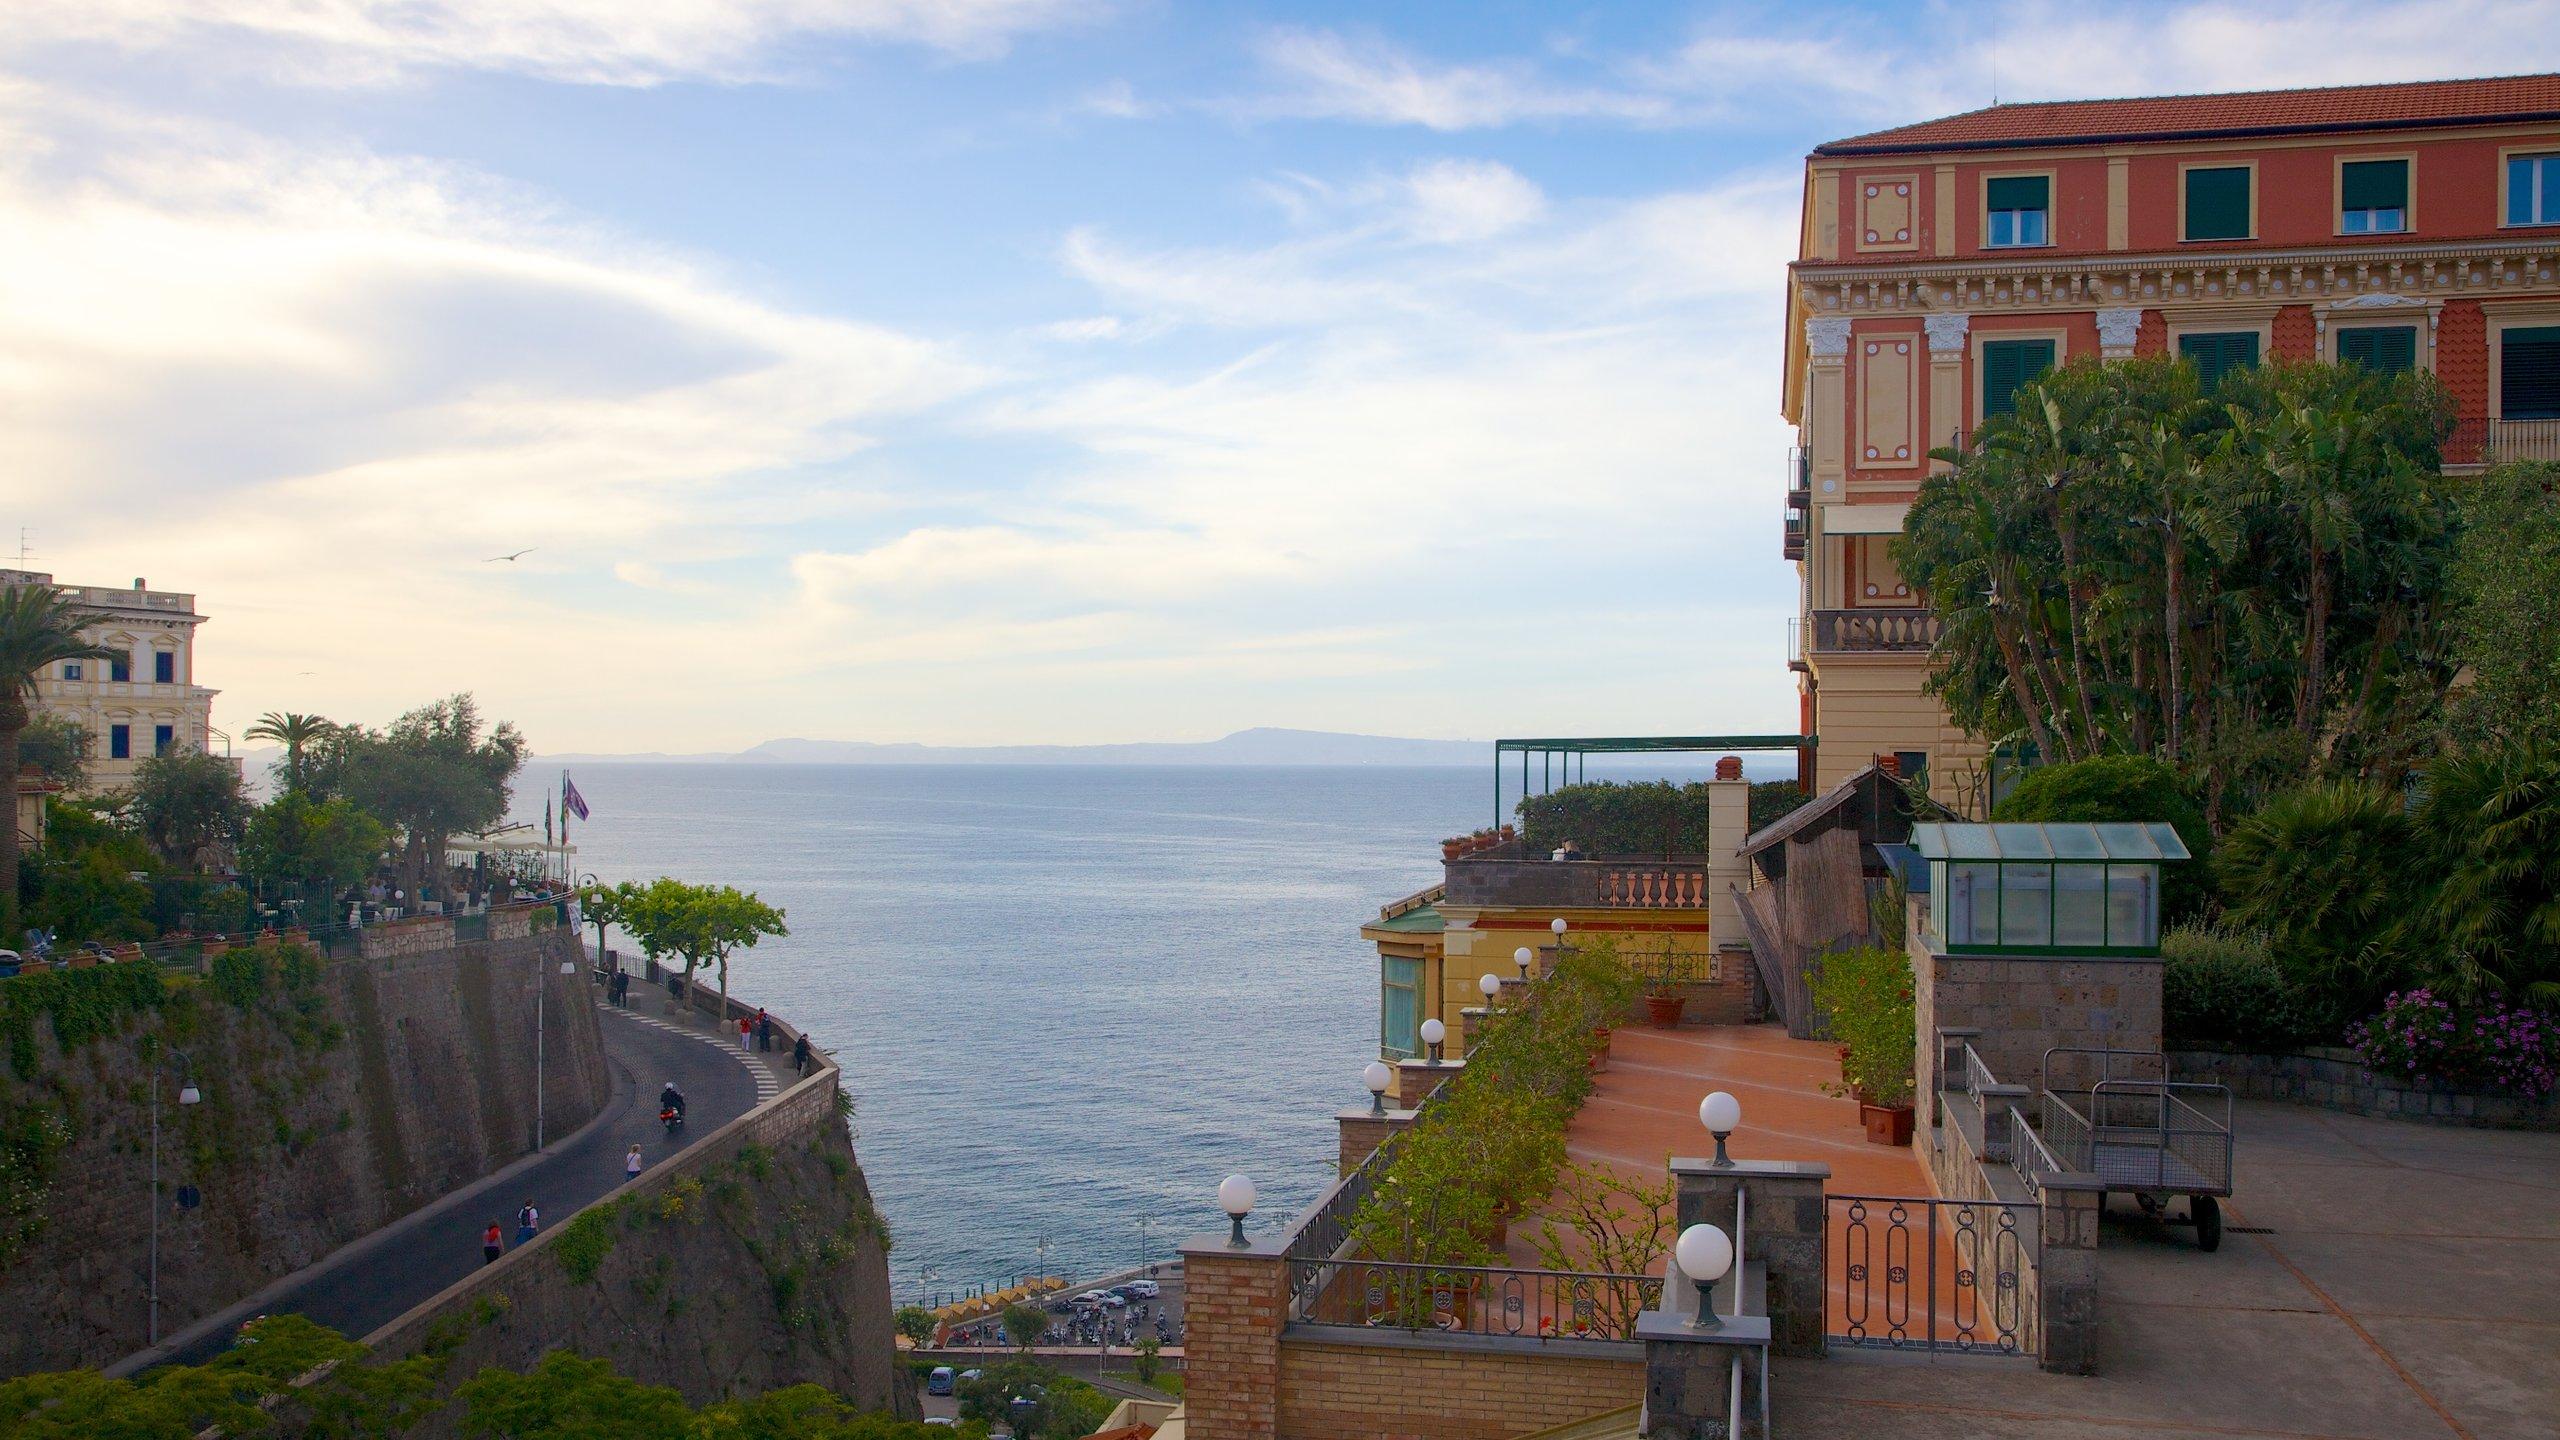 Metropolitan City of Naples, Italy